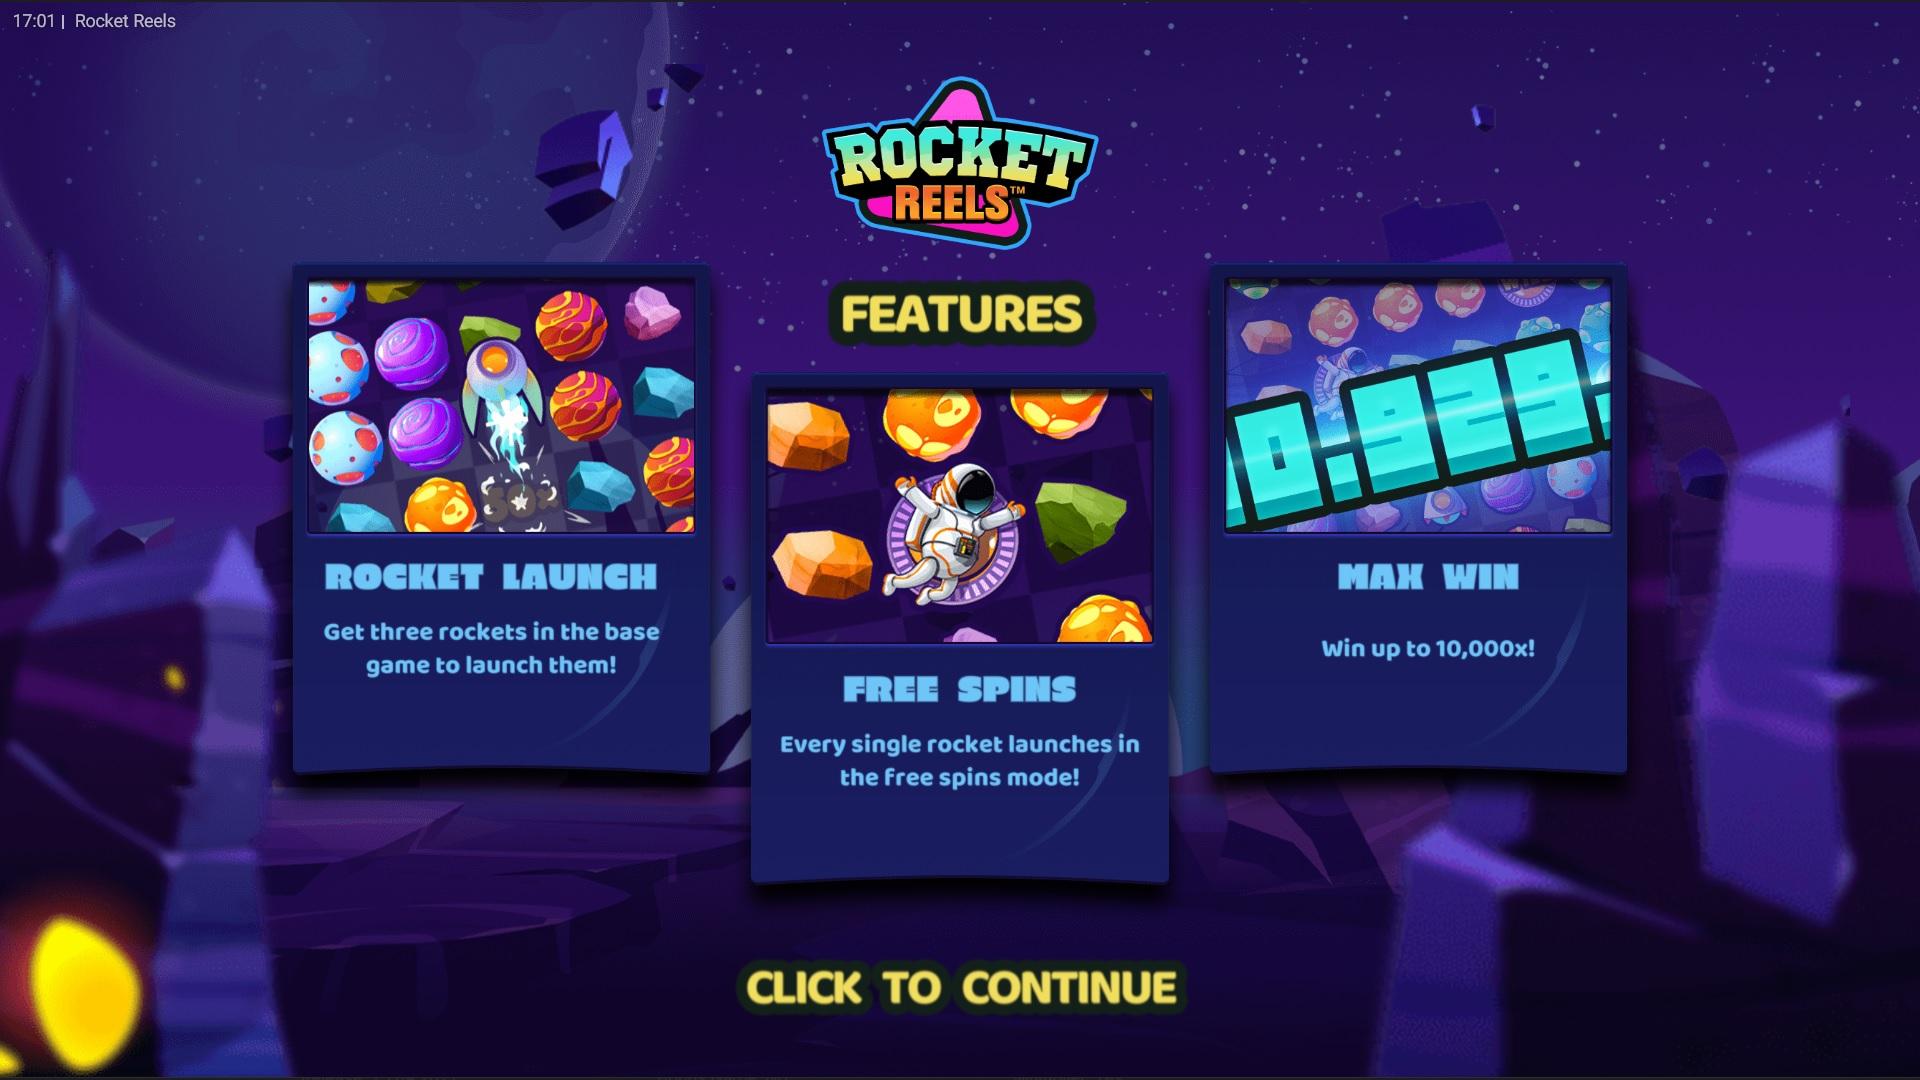 Special Features in Rocket Reel